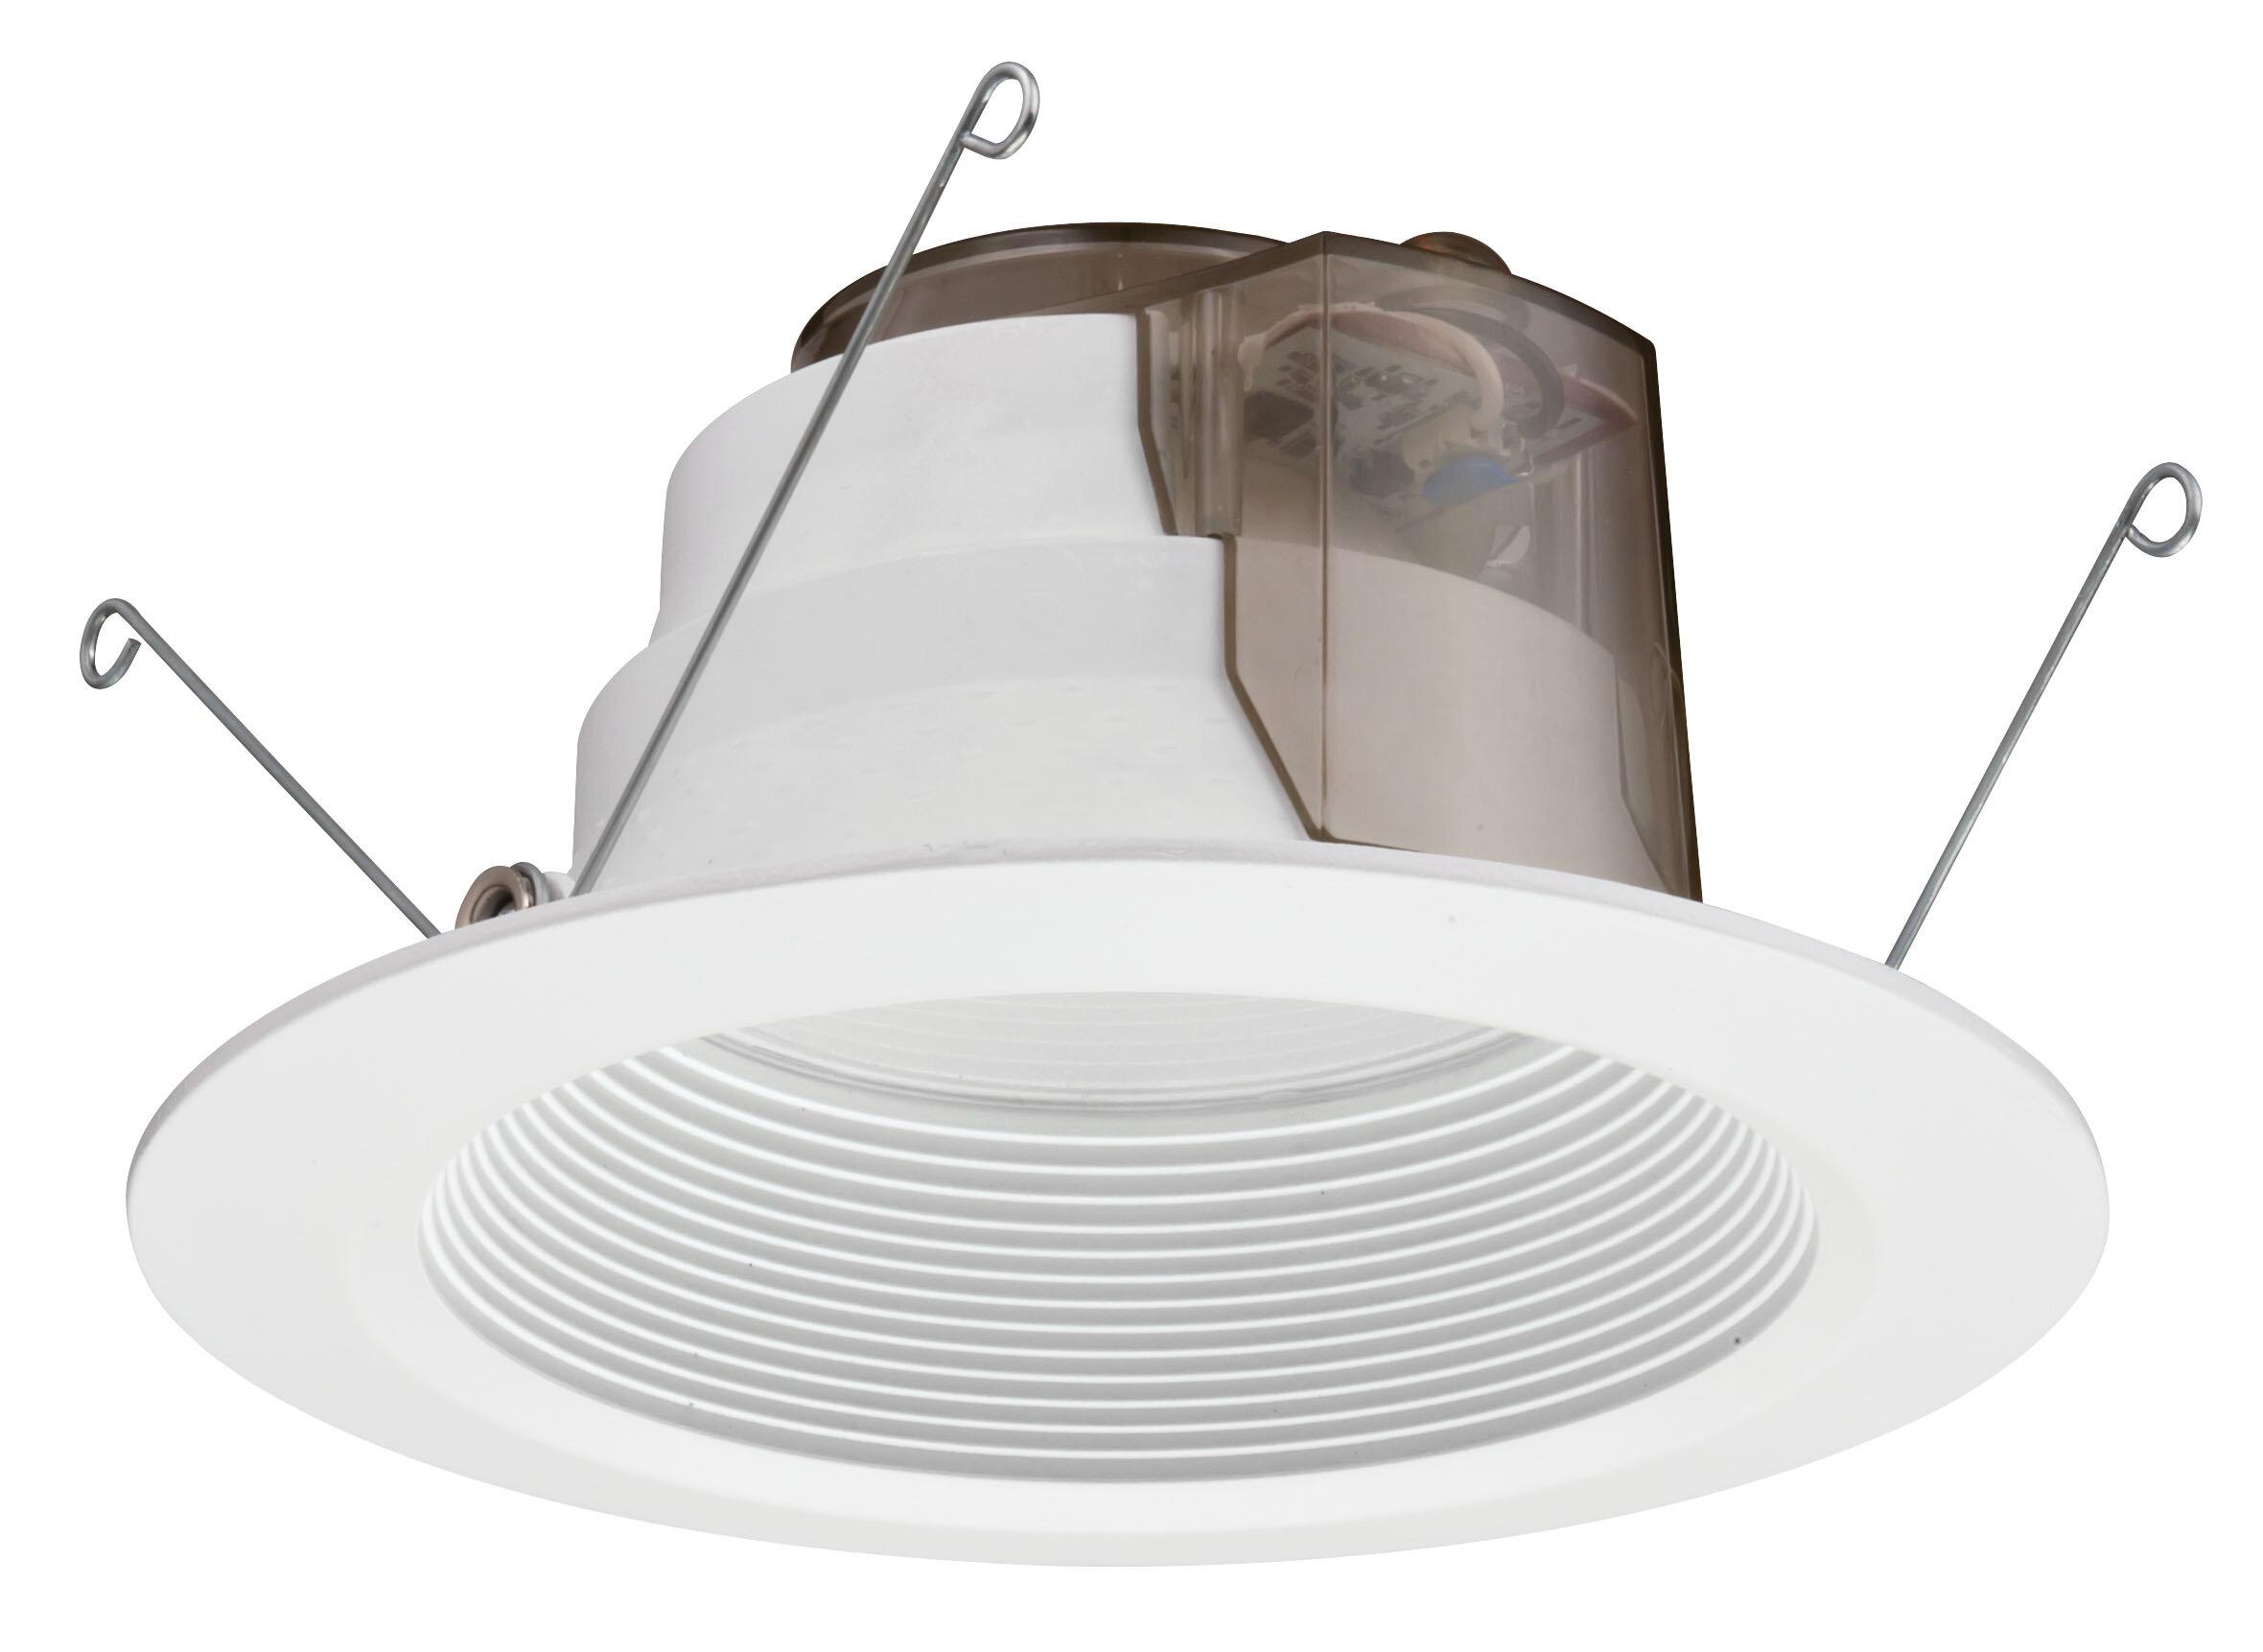 Lithonia Lighting P Series Remodel Led Retrofit Recessed Lighting Kit Wayfair